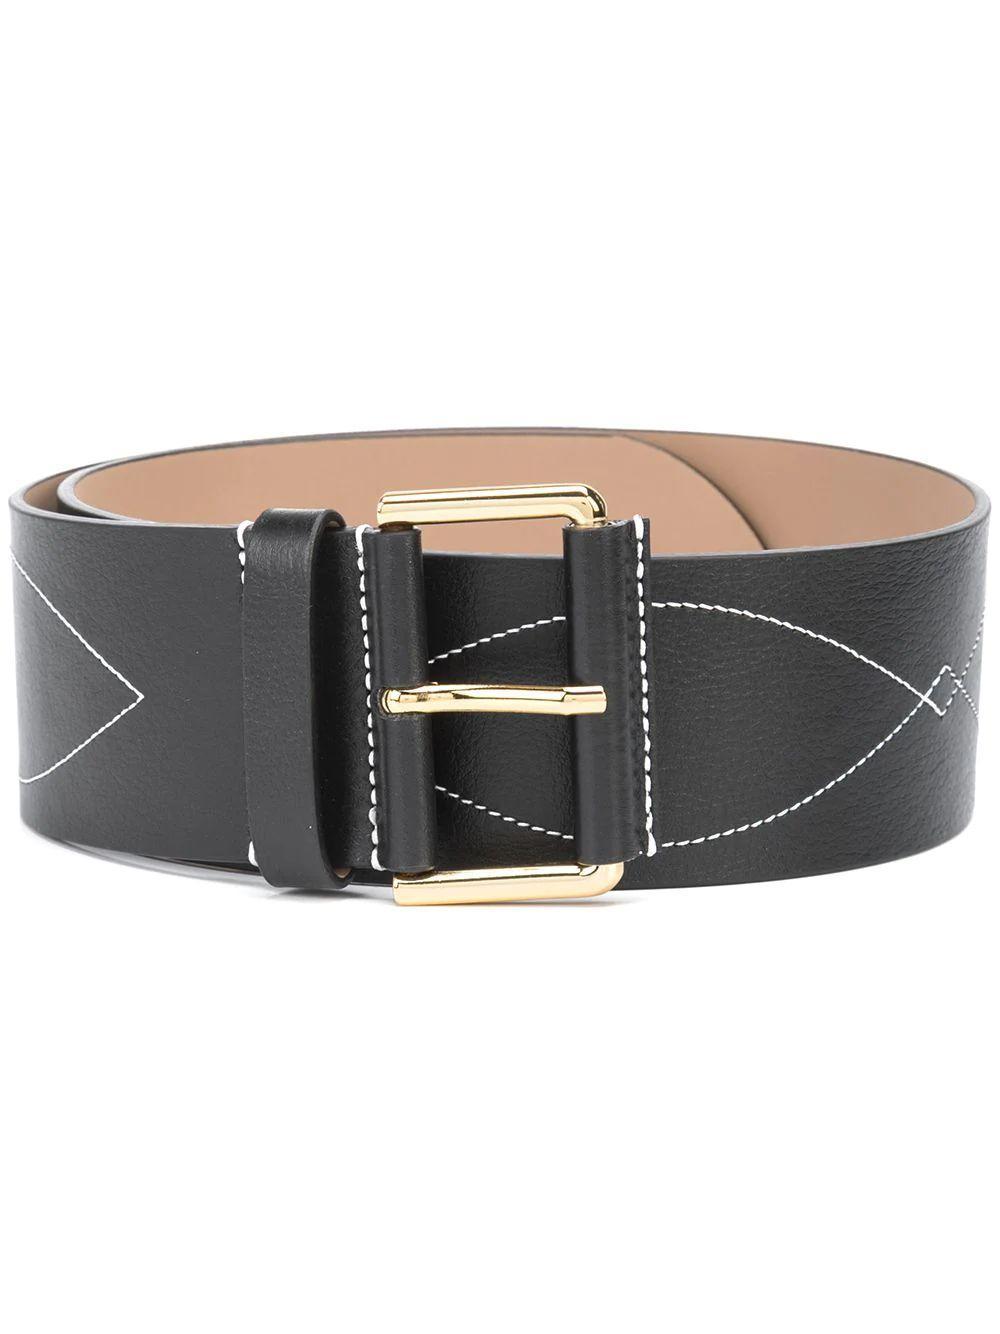 Wide Scout Belt Item # BW914-000LE